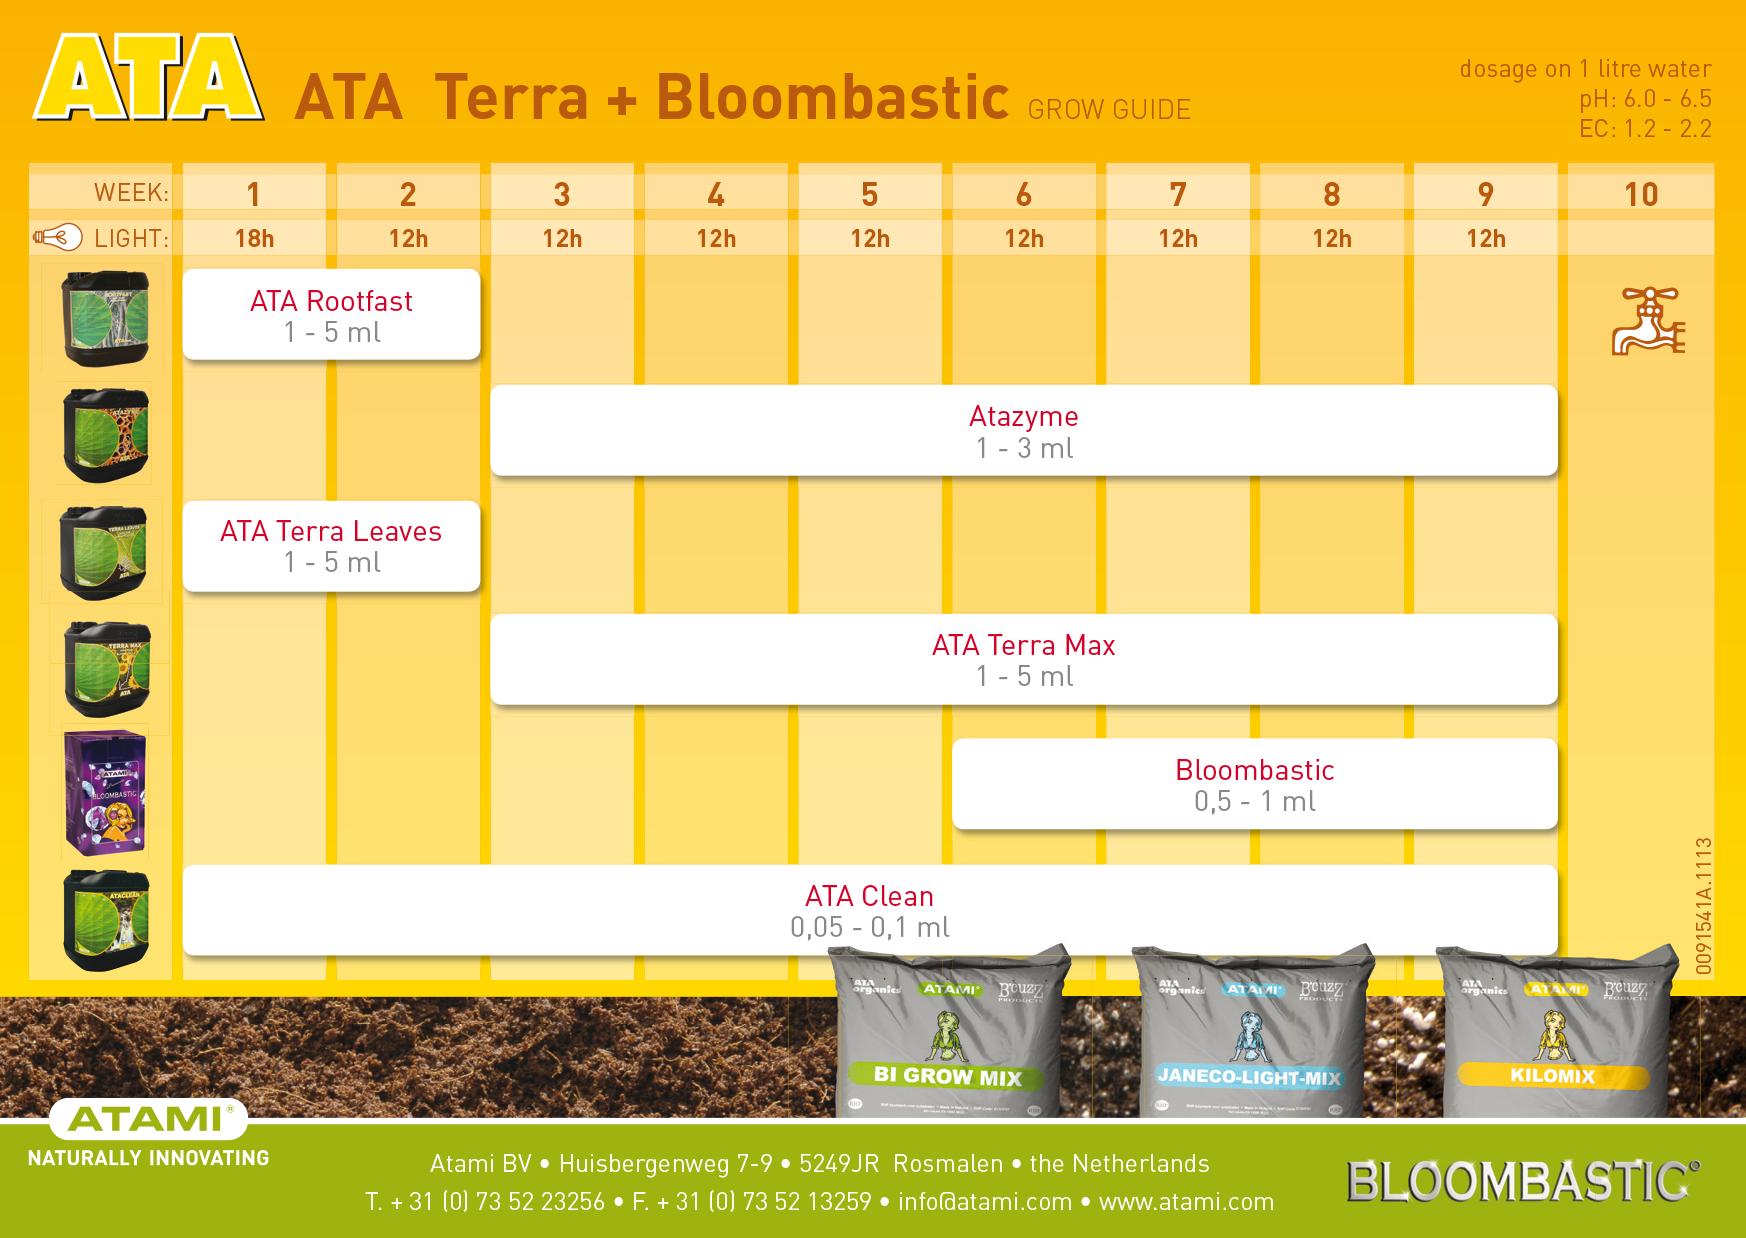 tabla de cultivo ata terra bloombastic